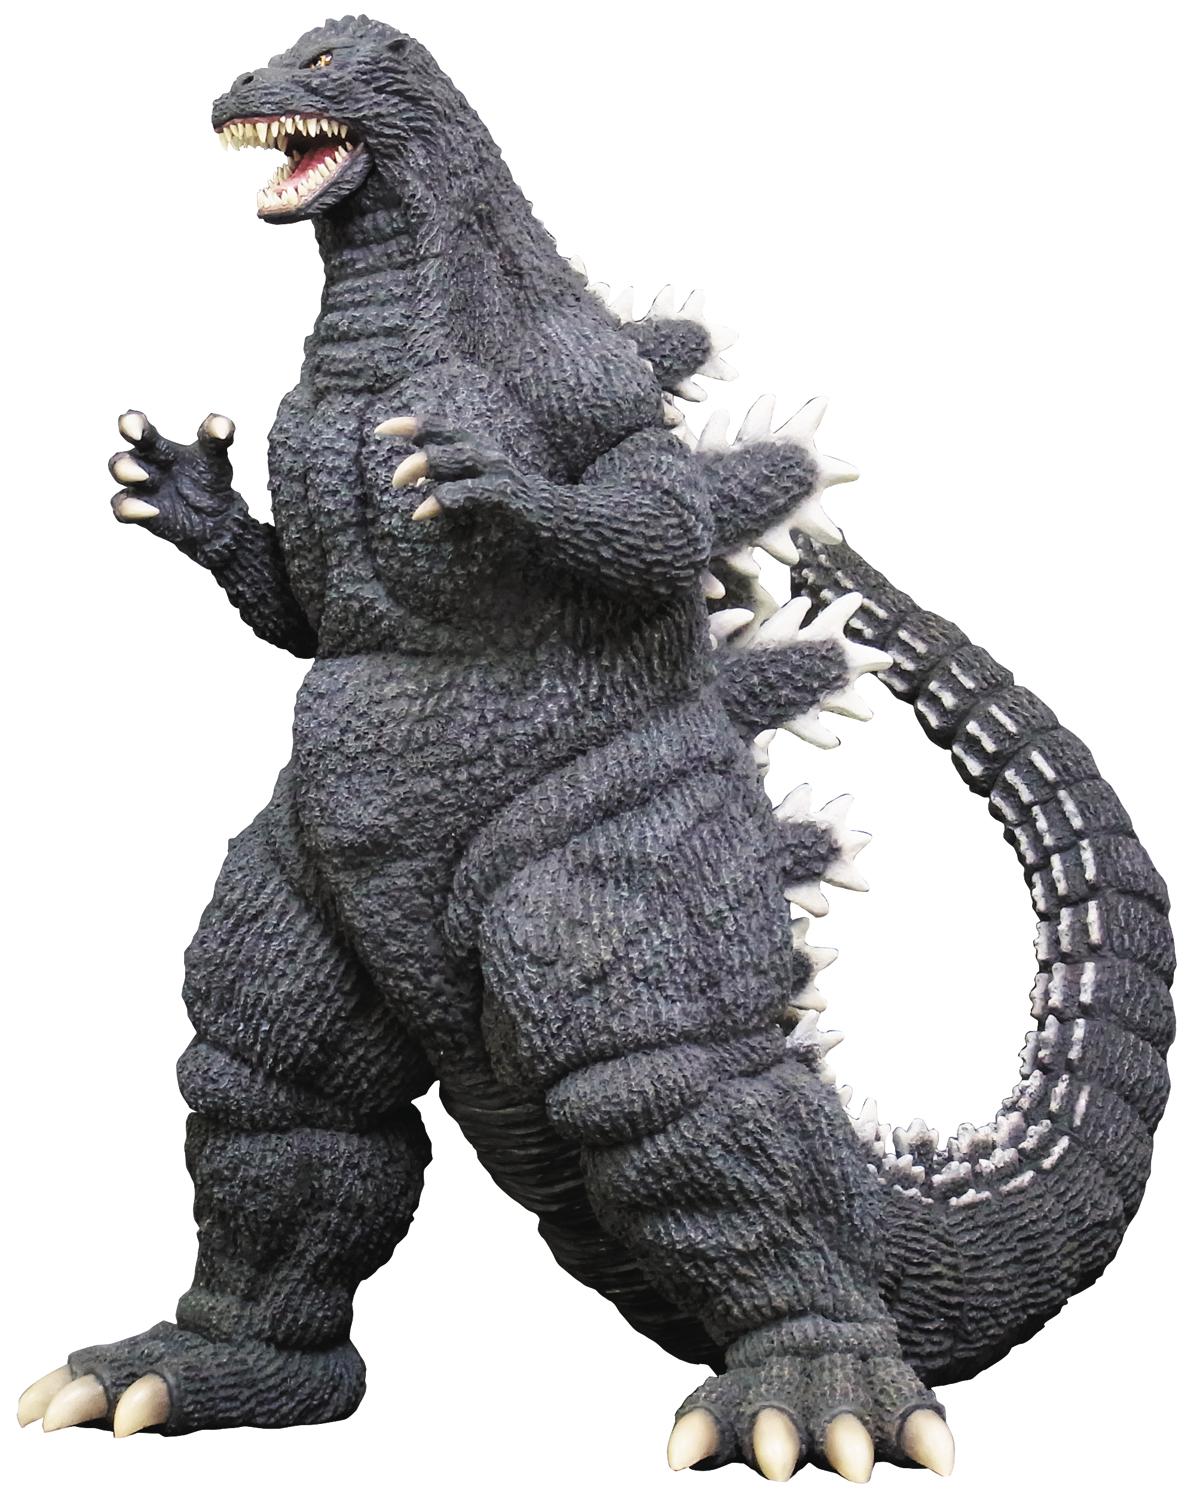 Apr158701 Godzilla 12in Ser Godzilla 1992 Battle For